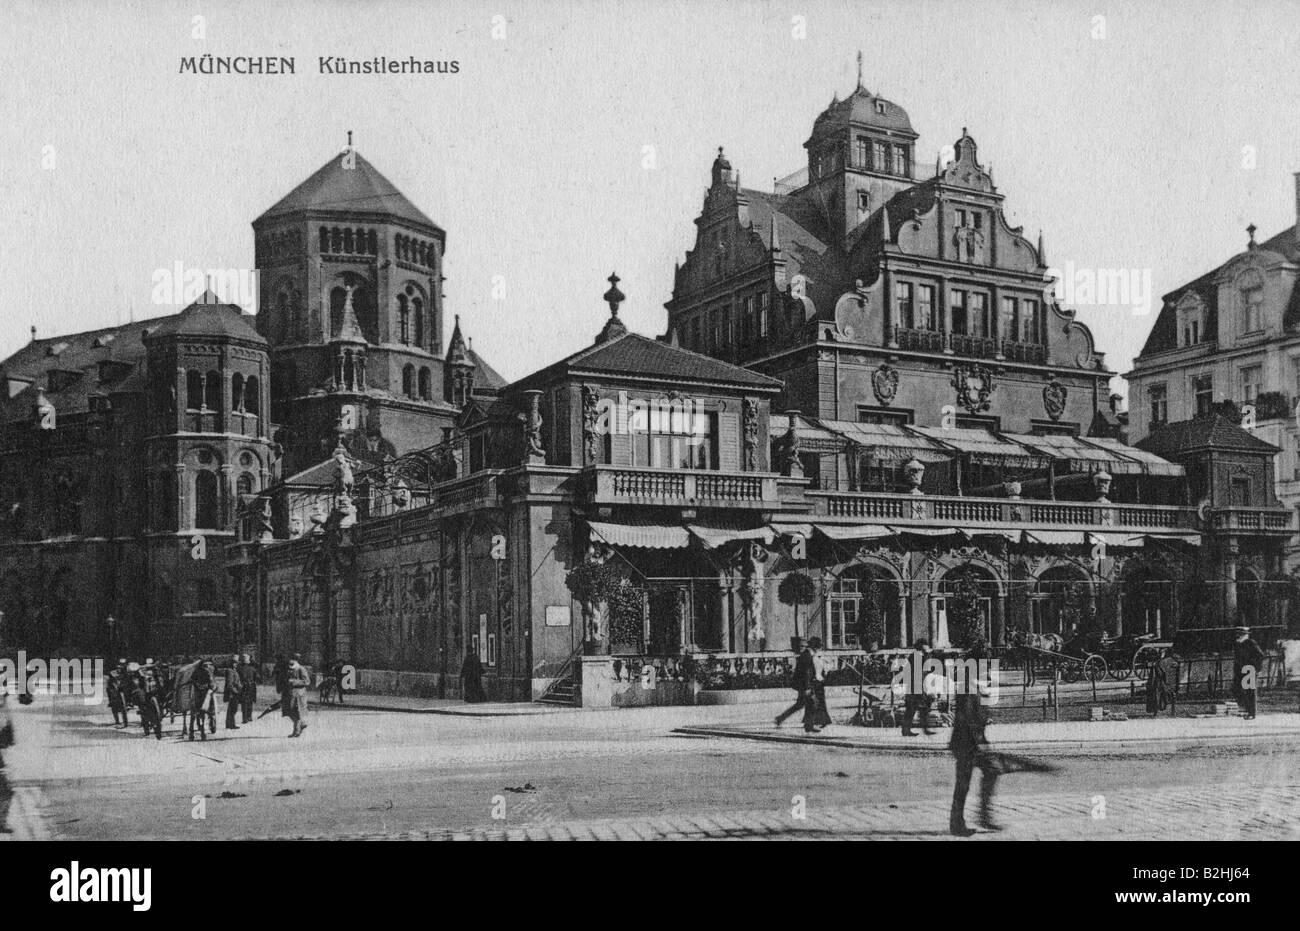 geography/travel, Germany, Munich,Lenbachplatz, Künstlerhaus and Synagogue, postcard, circa 1905, Additional - Stock Image